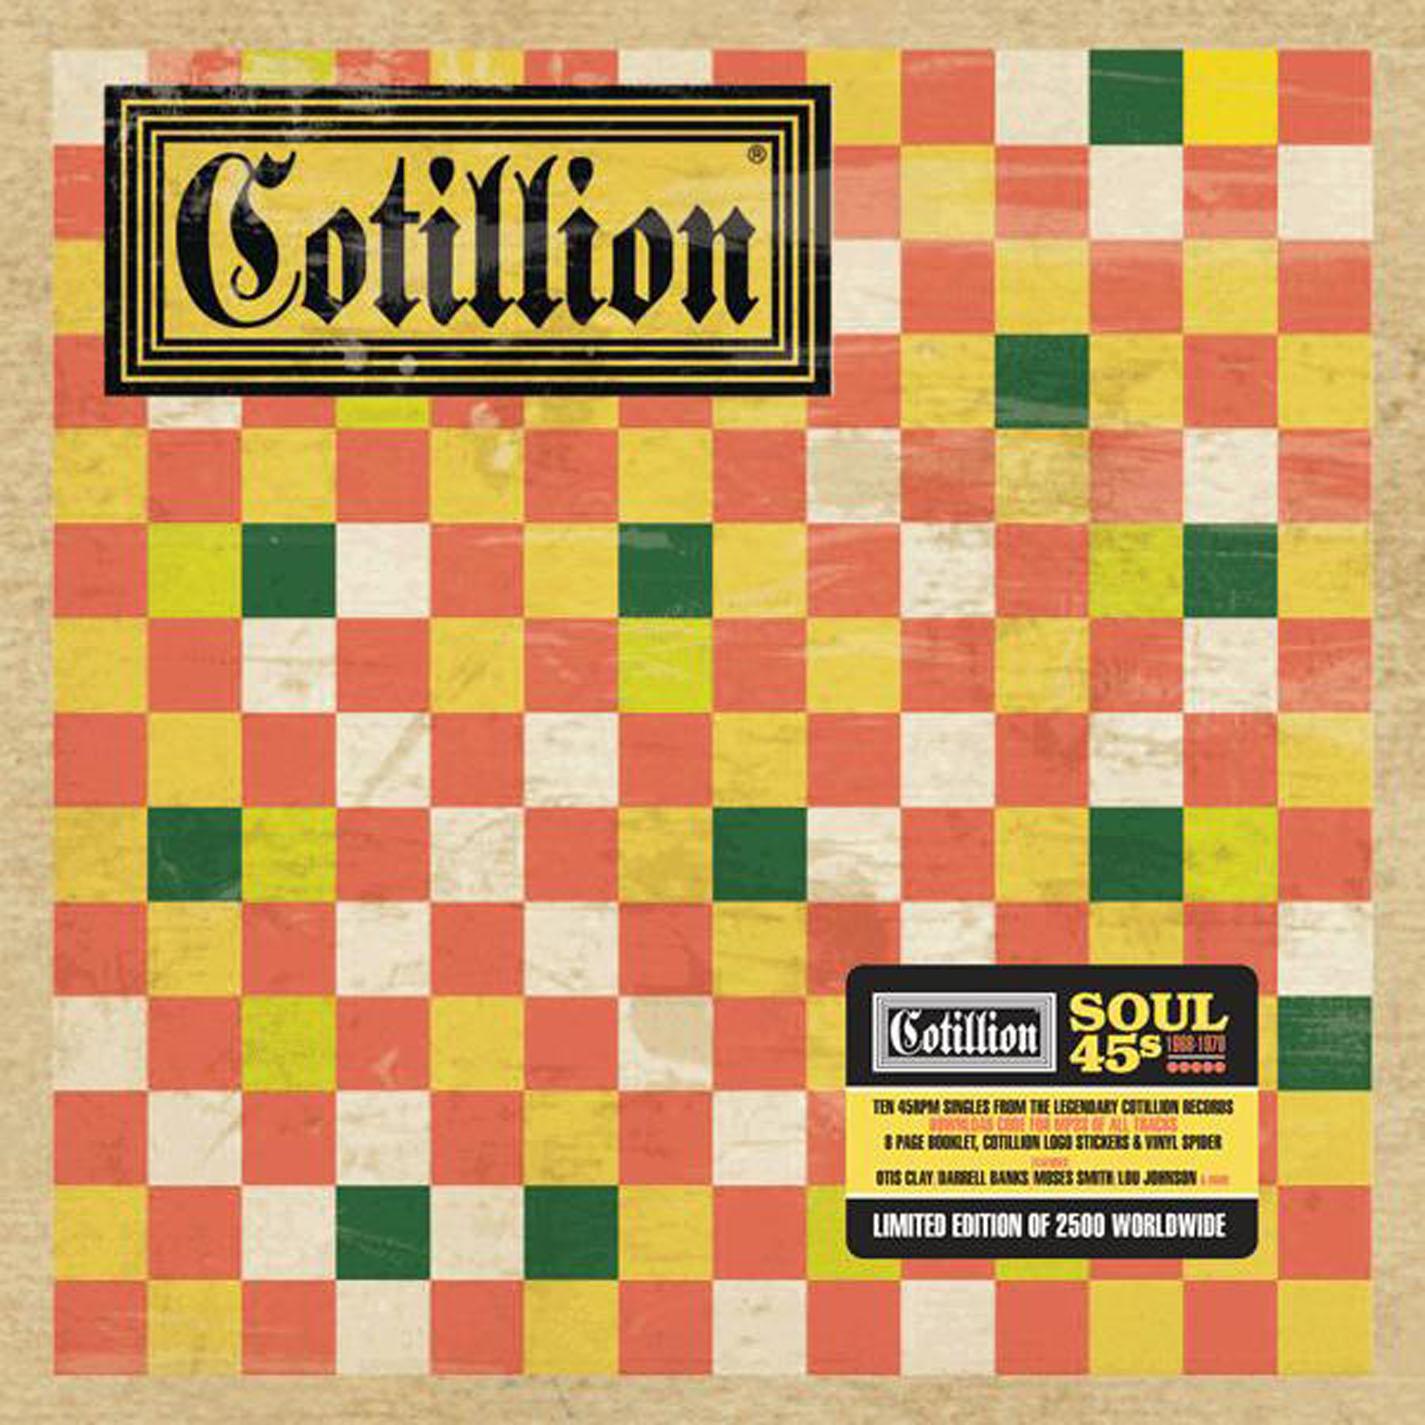 Cotillion Music s tracks